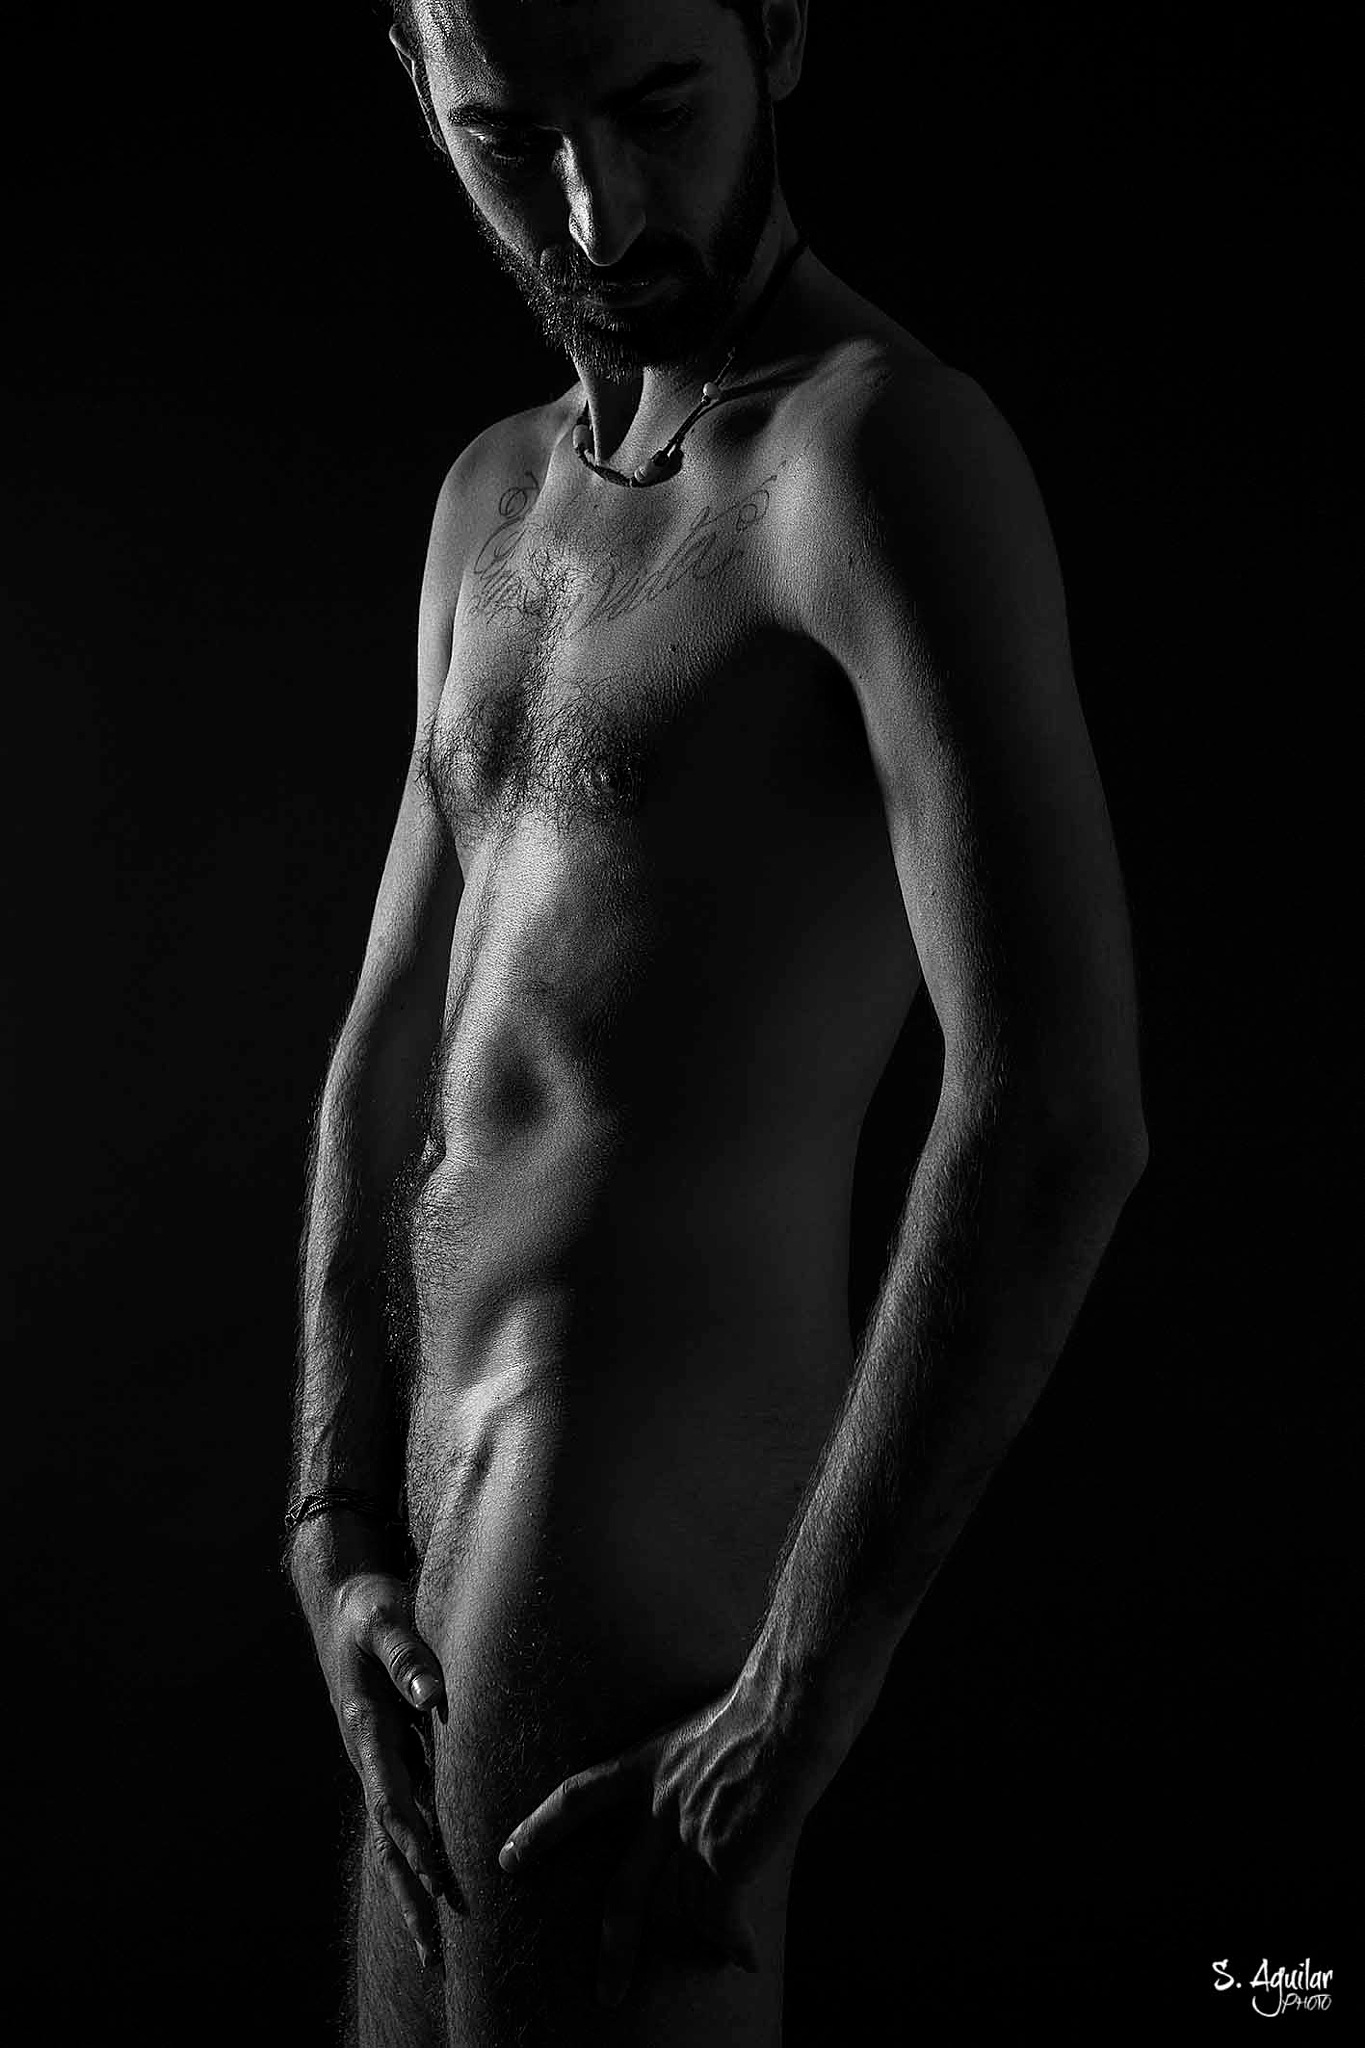 Nude  by Salvador Aguilar